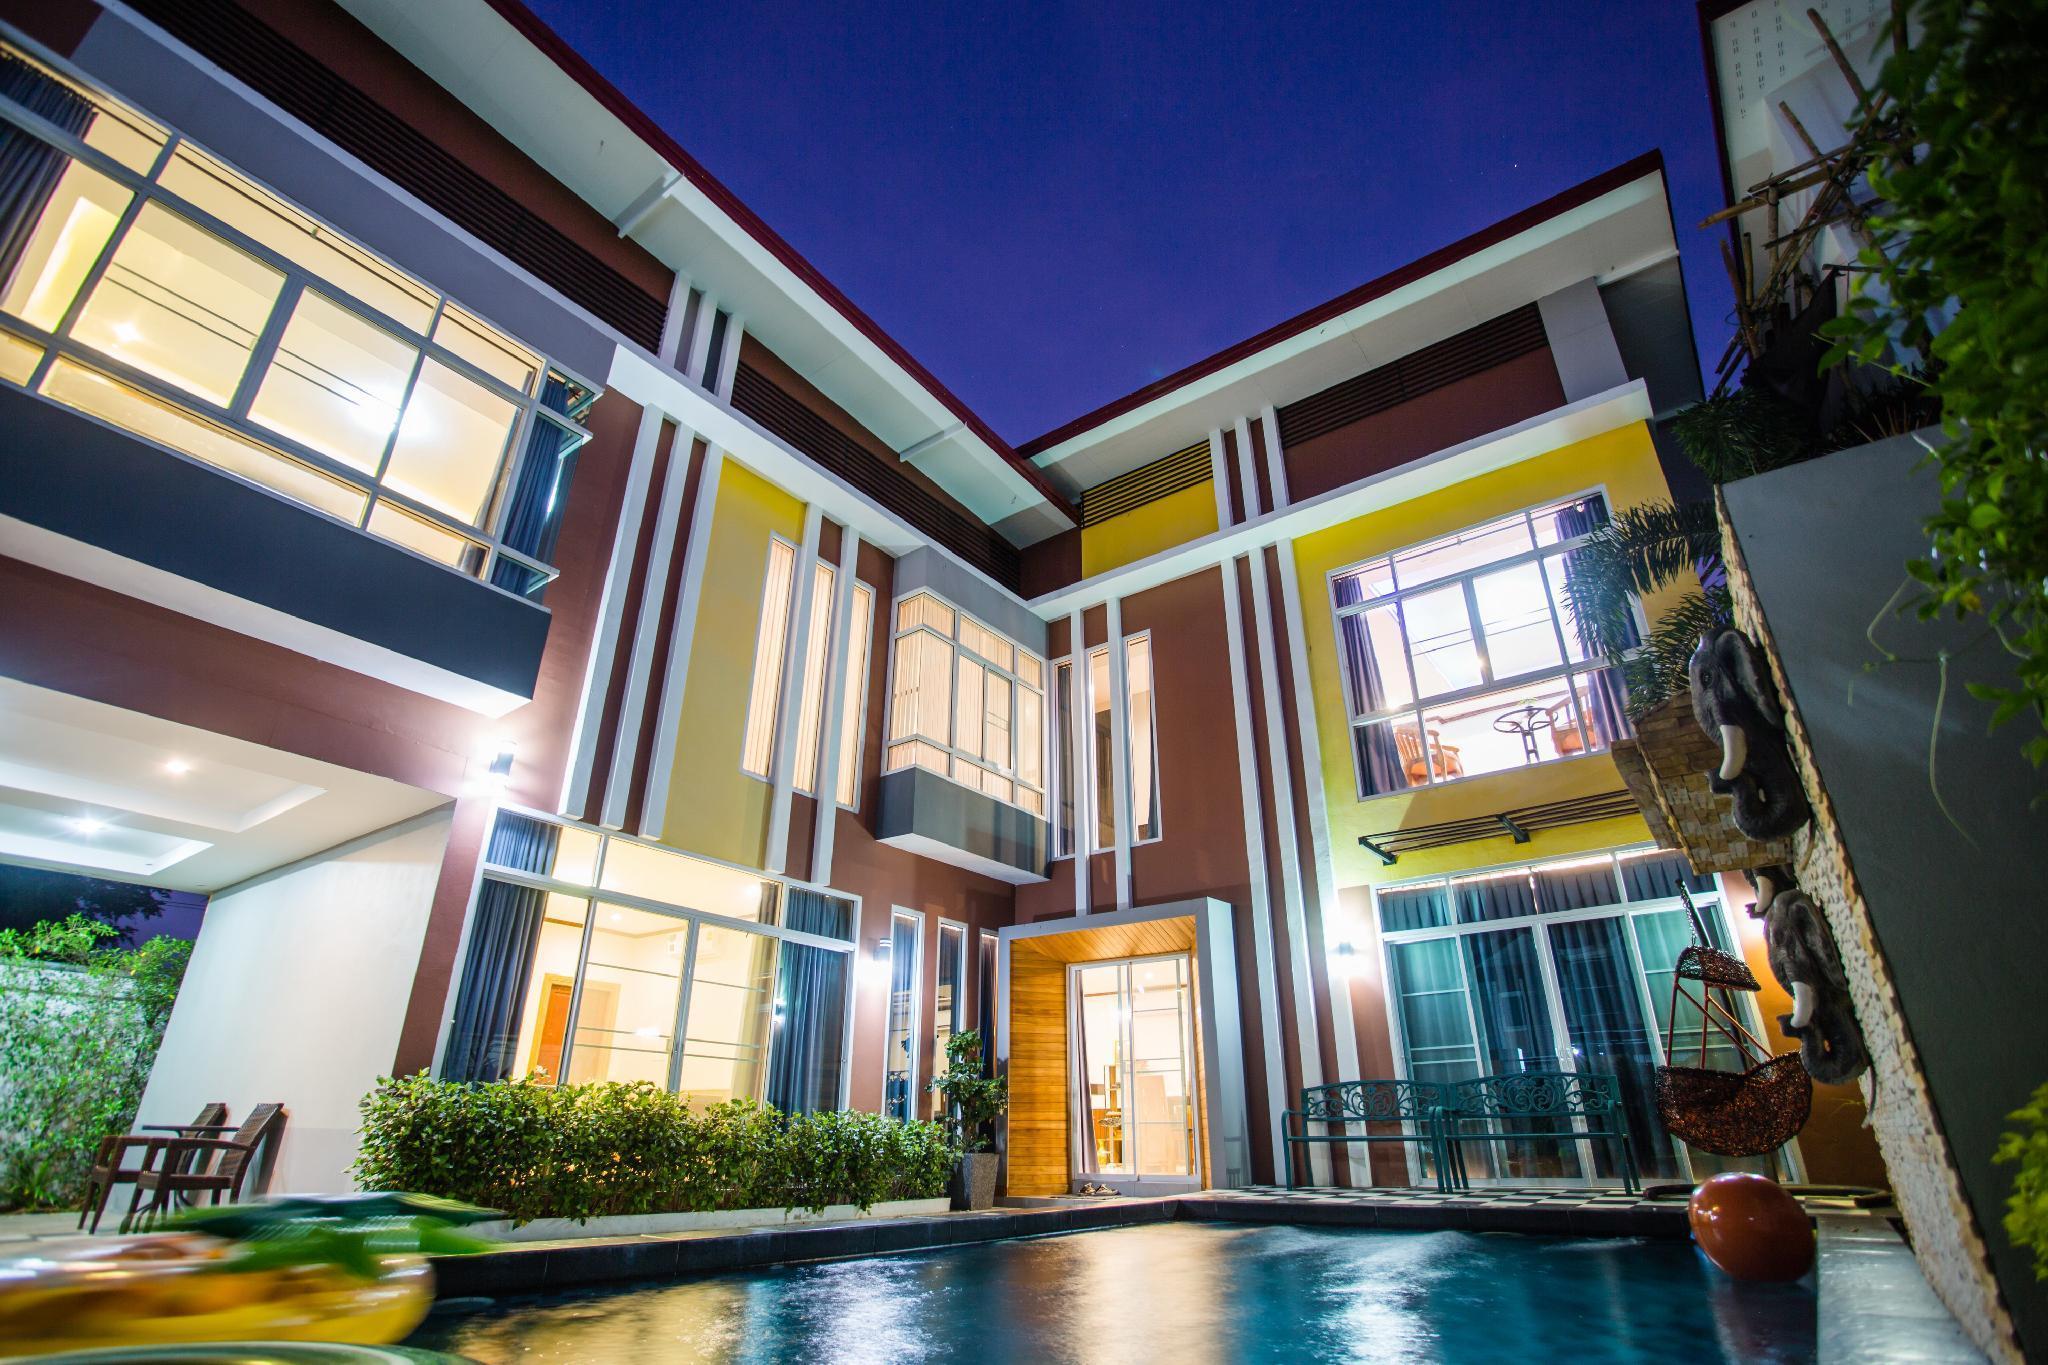 Chiang Mai 4 Bedroom Pool Villa วิลลา 4 ห้องนอน 5 ห้องน้ำส่วนตัว ขนาด 600 ตร.ม. – สันทราย